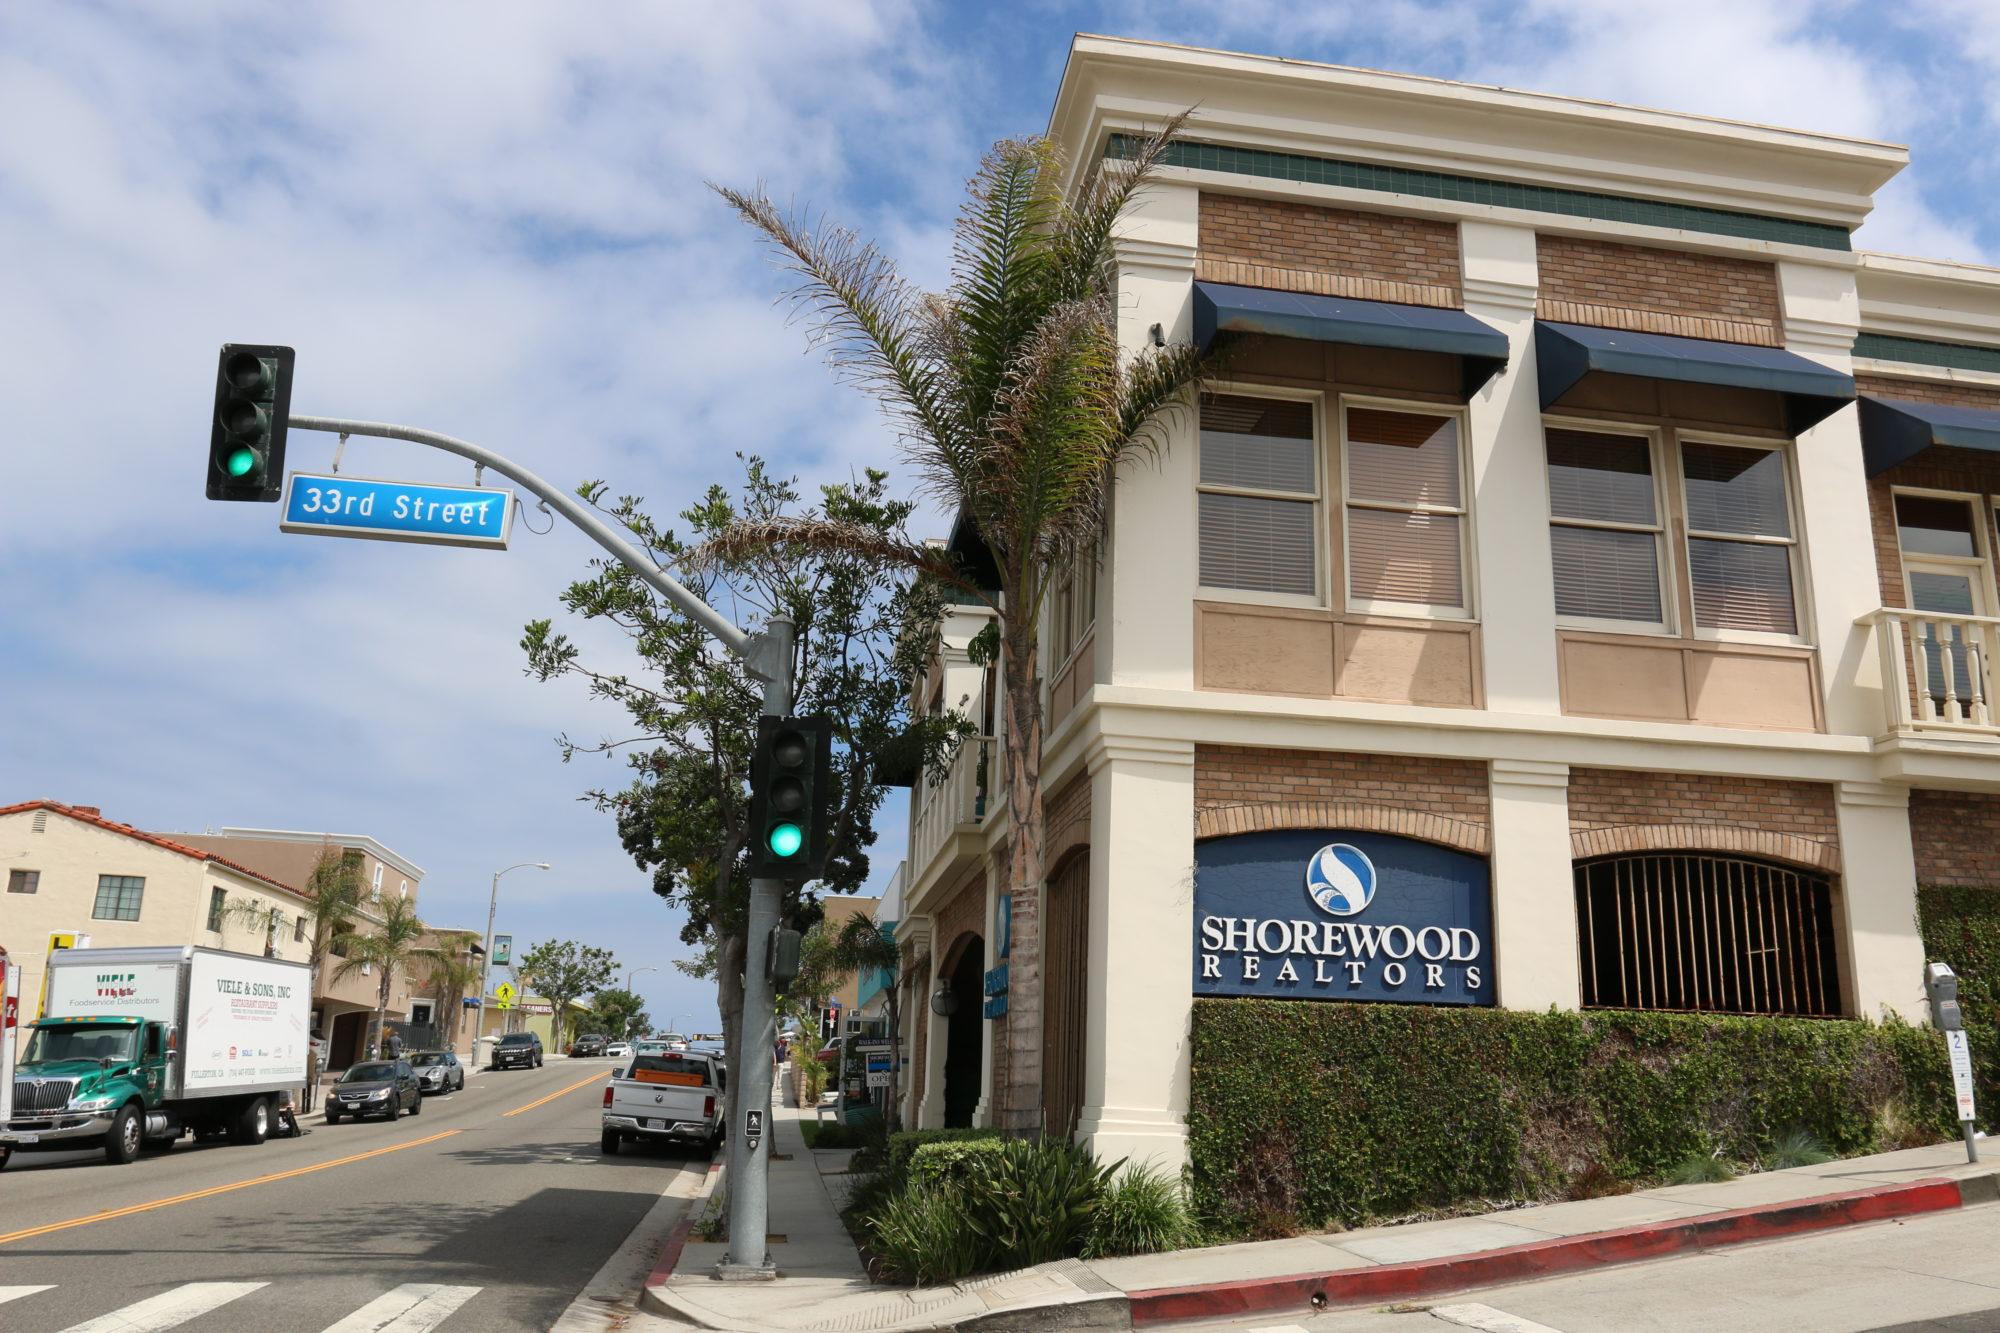 Shorewood Realtors files for Chapter 11 bankruptcy